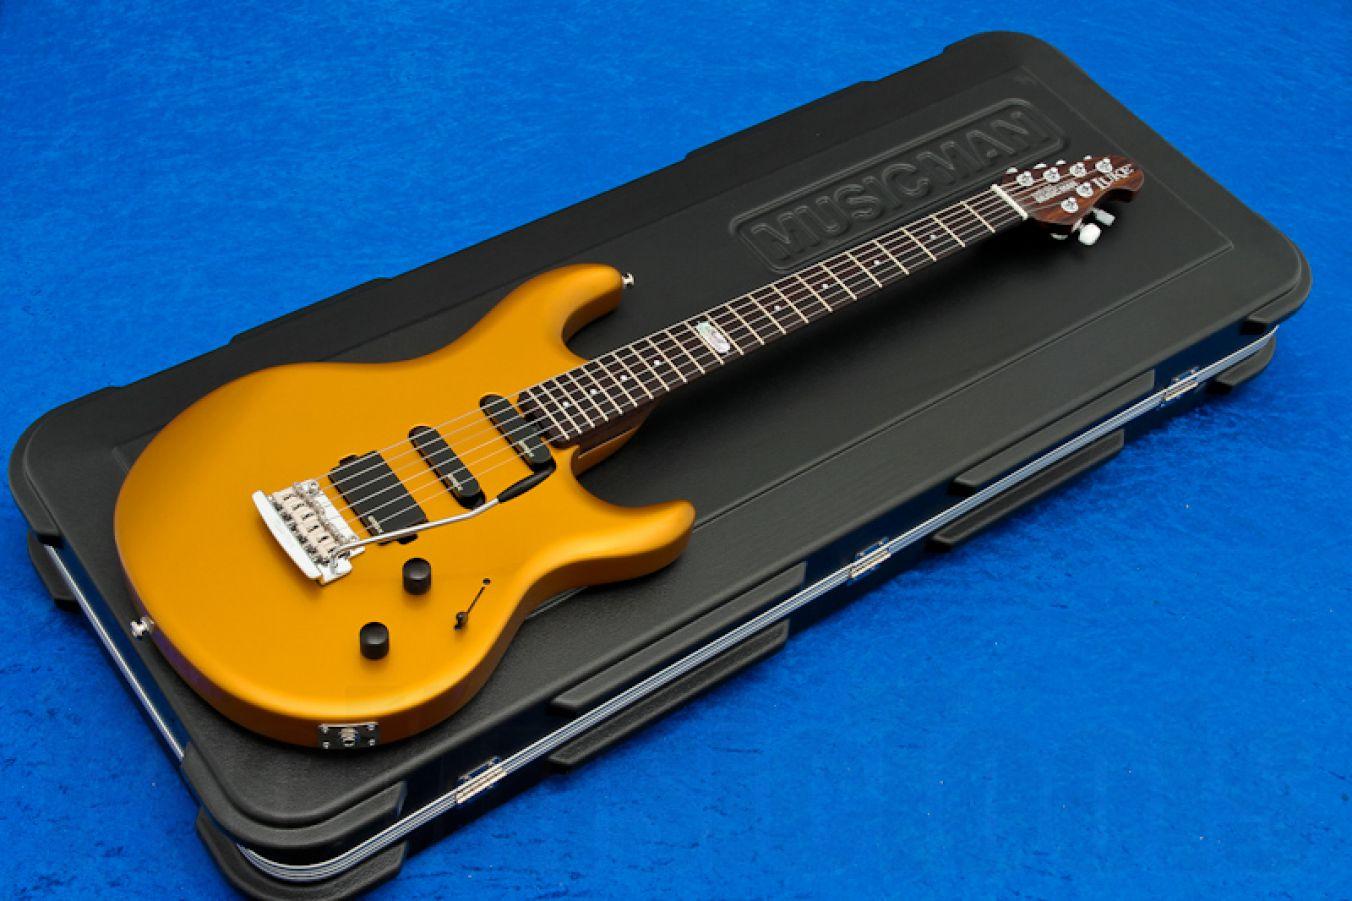 Music Man USA Luke BFR TGO - True Gold Rosewood Neck PDN Limited Edition